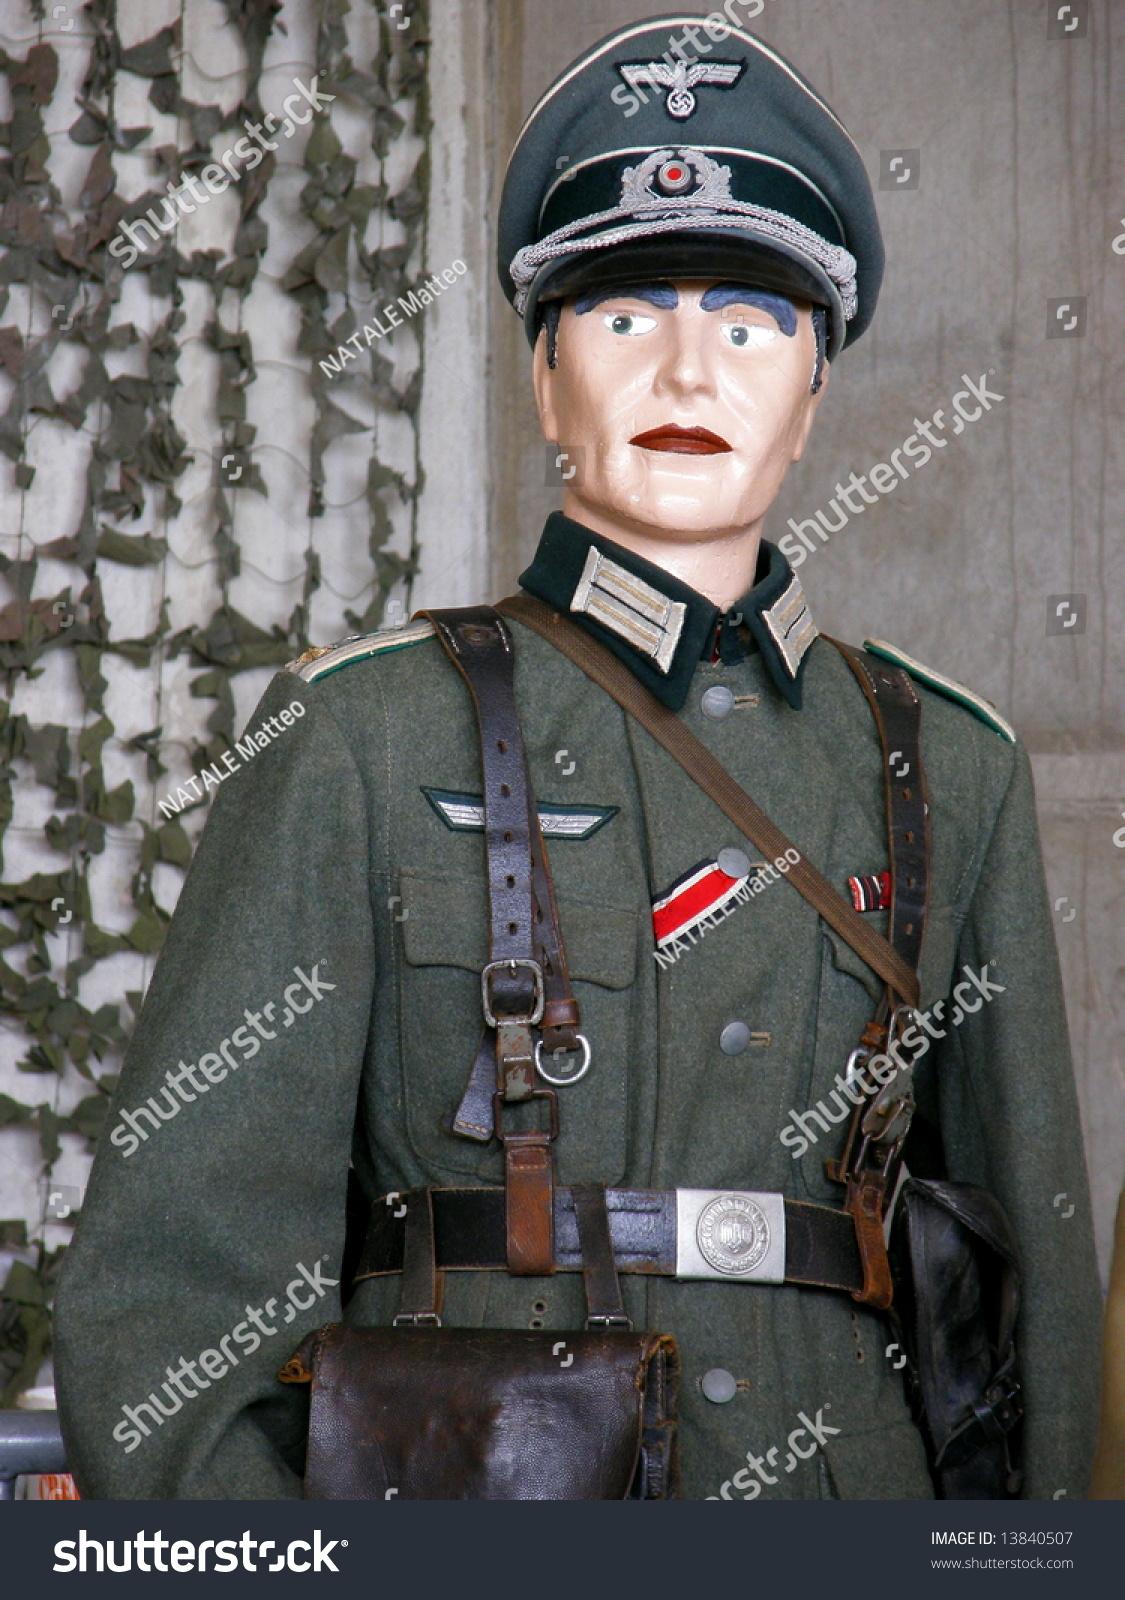 German Officer Wehrmacht Stock Photo 13840507 - Shutterstock